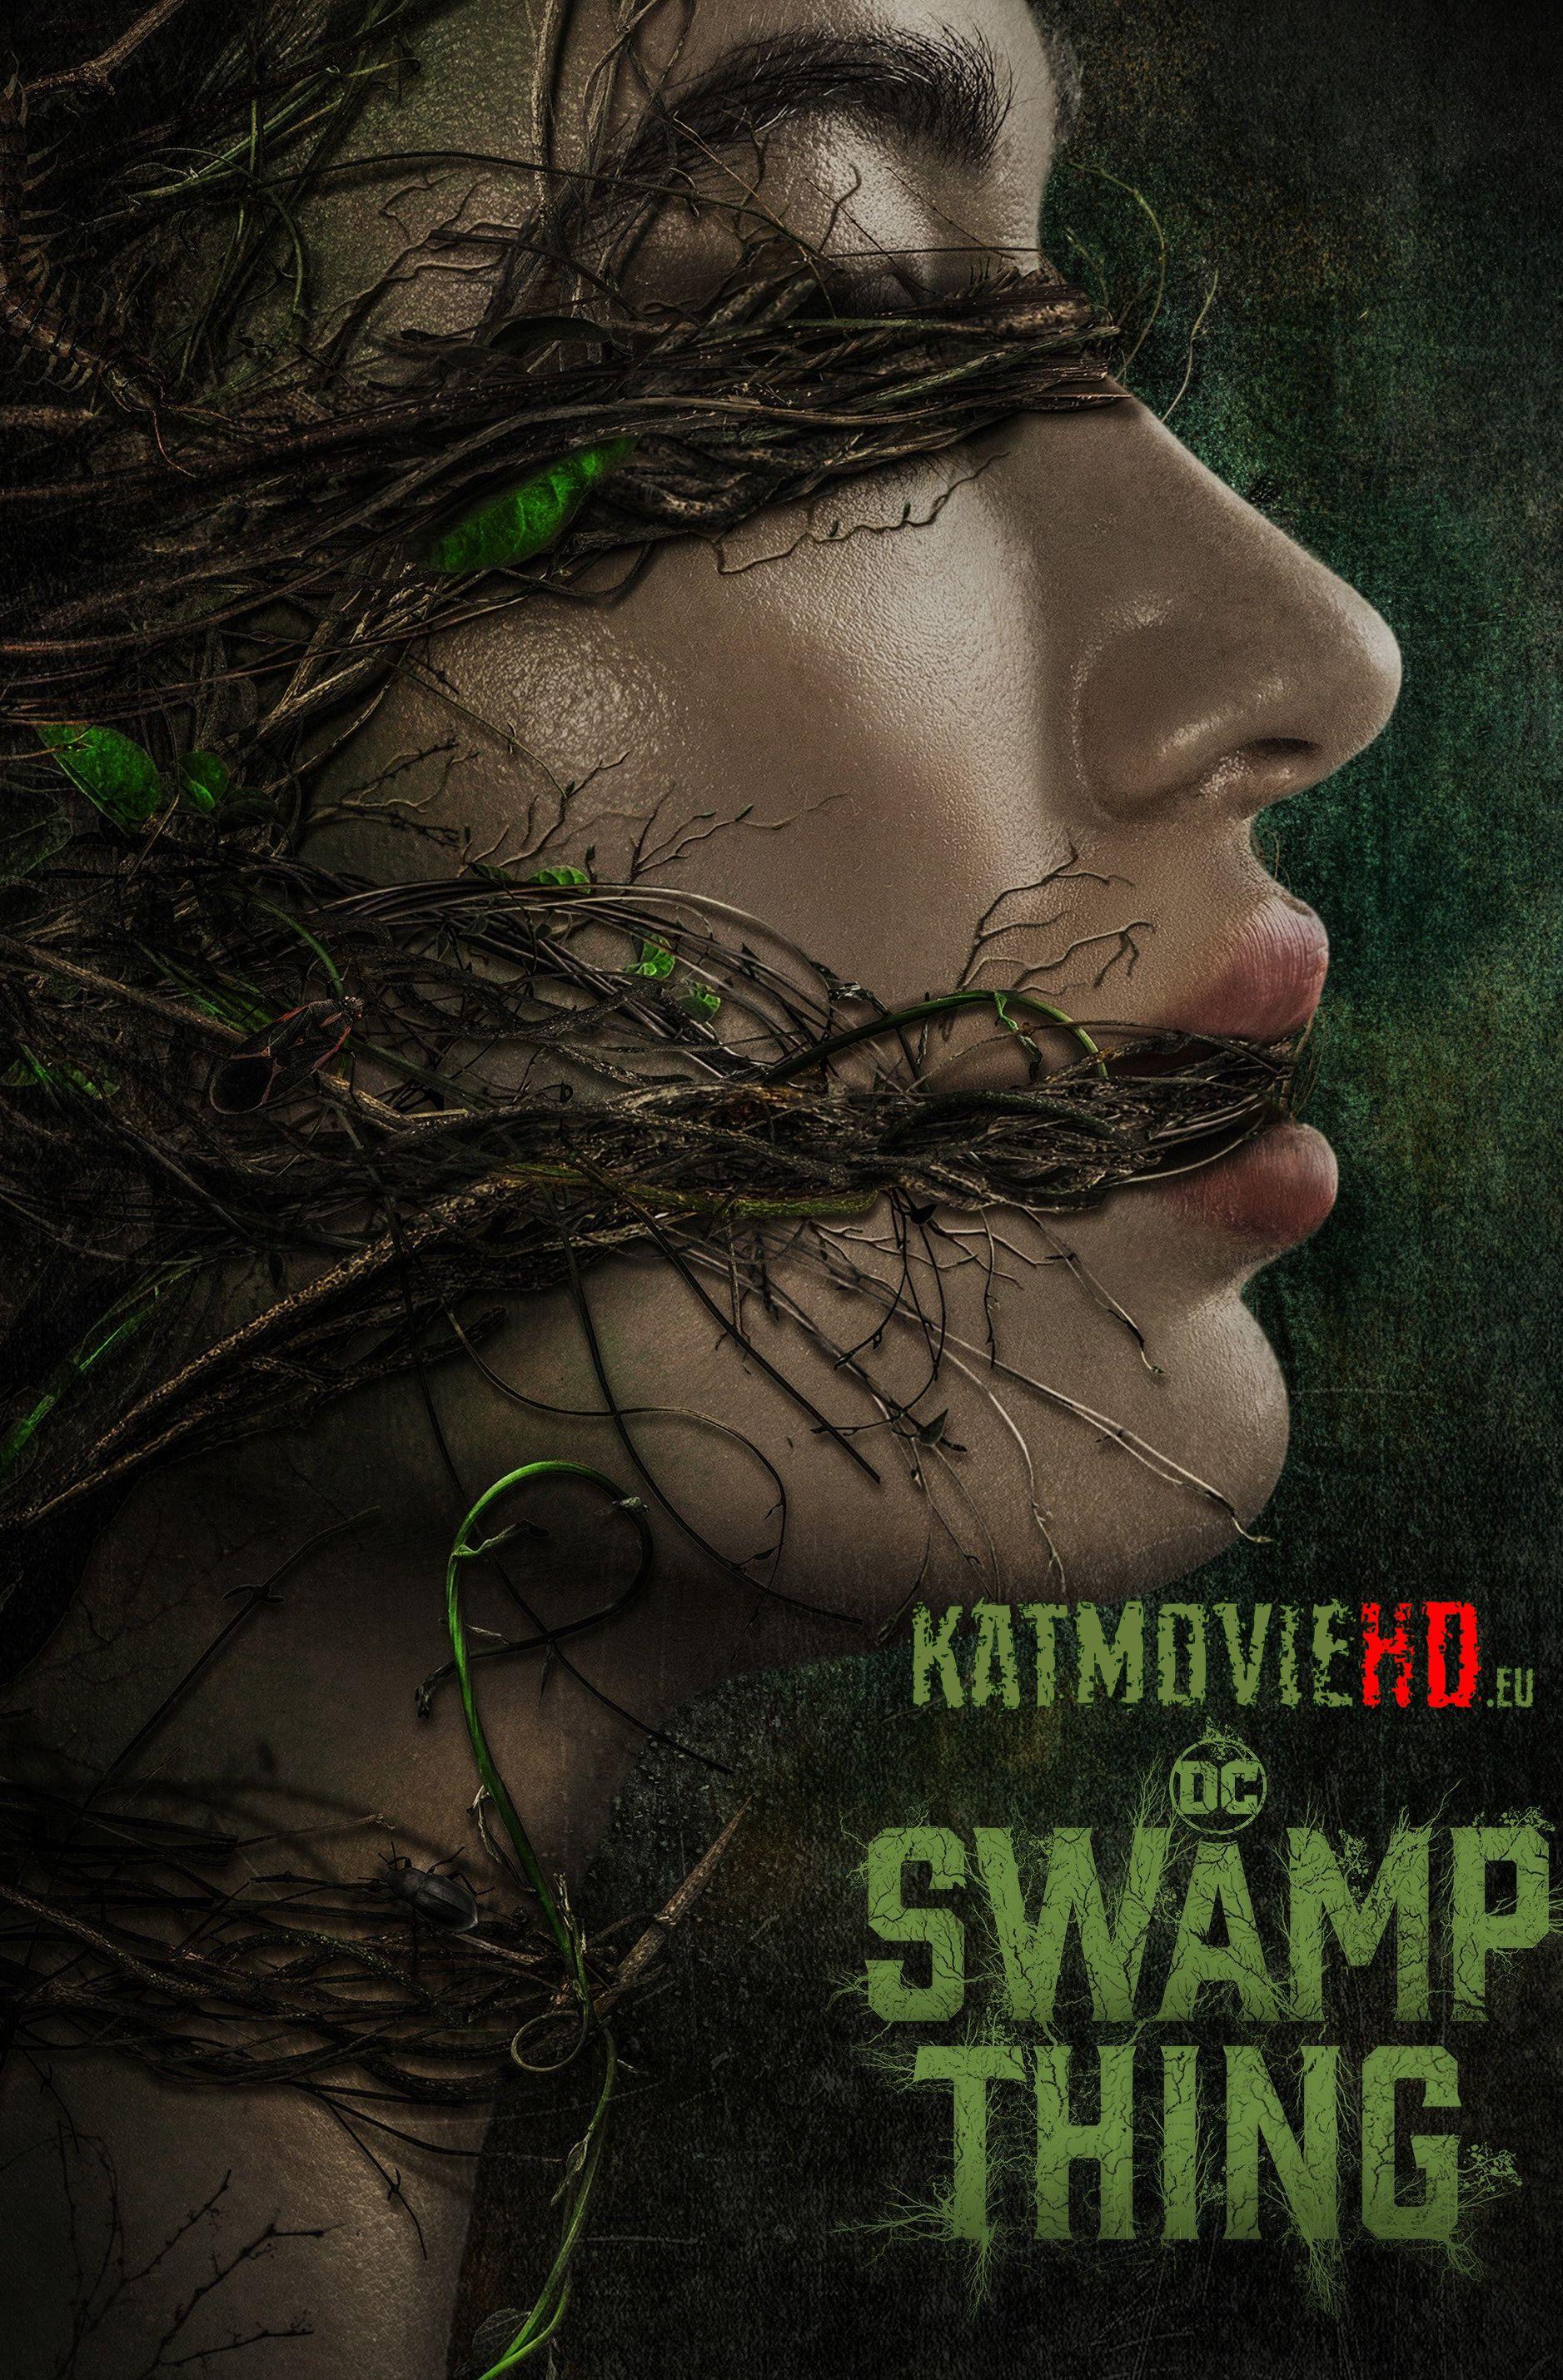 Swamp Thing S01 (Season 1)  Complete All Episodes | HDTV Web-DL 720p 1080p | KatmovieHD #swampthing